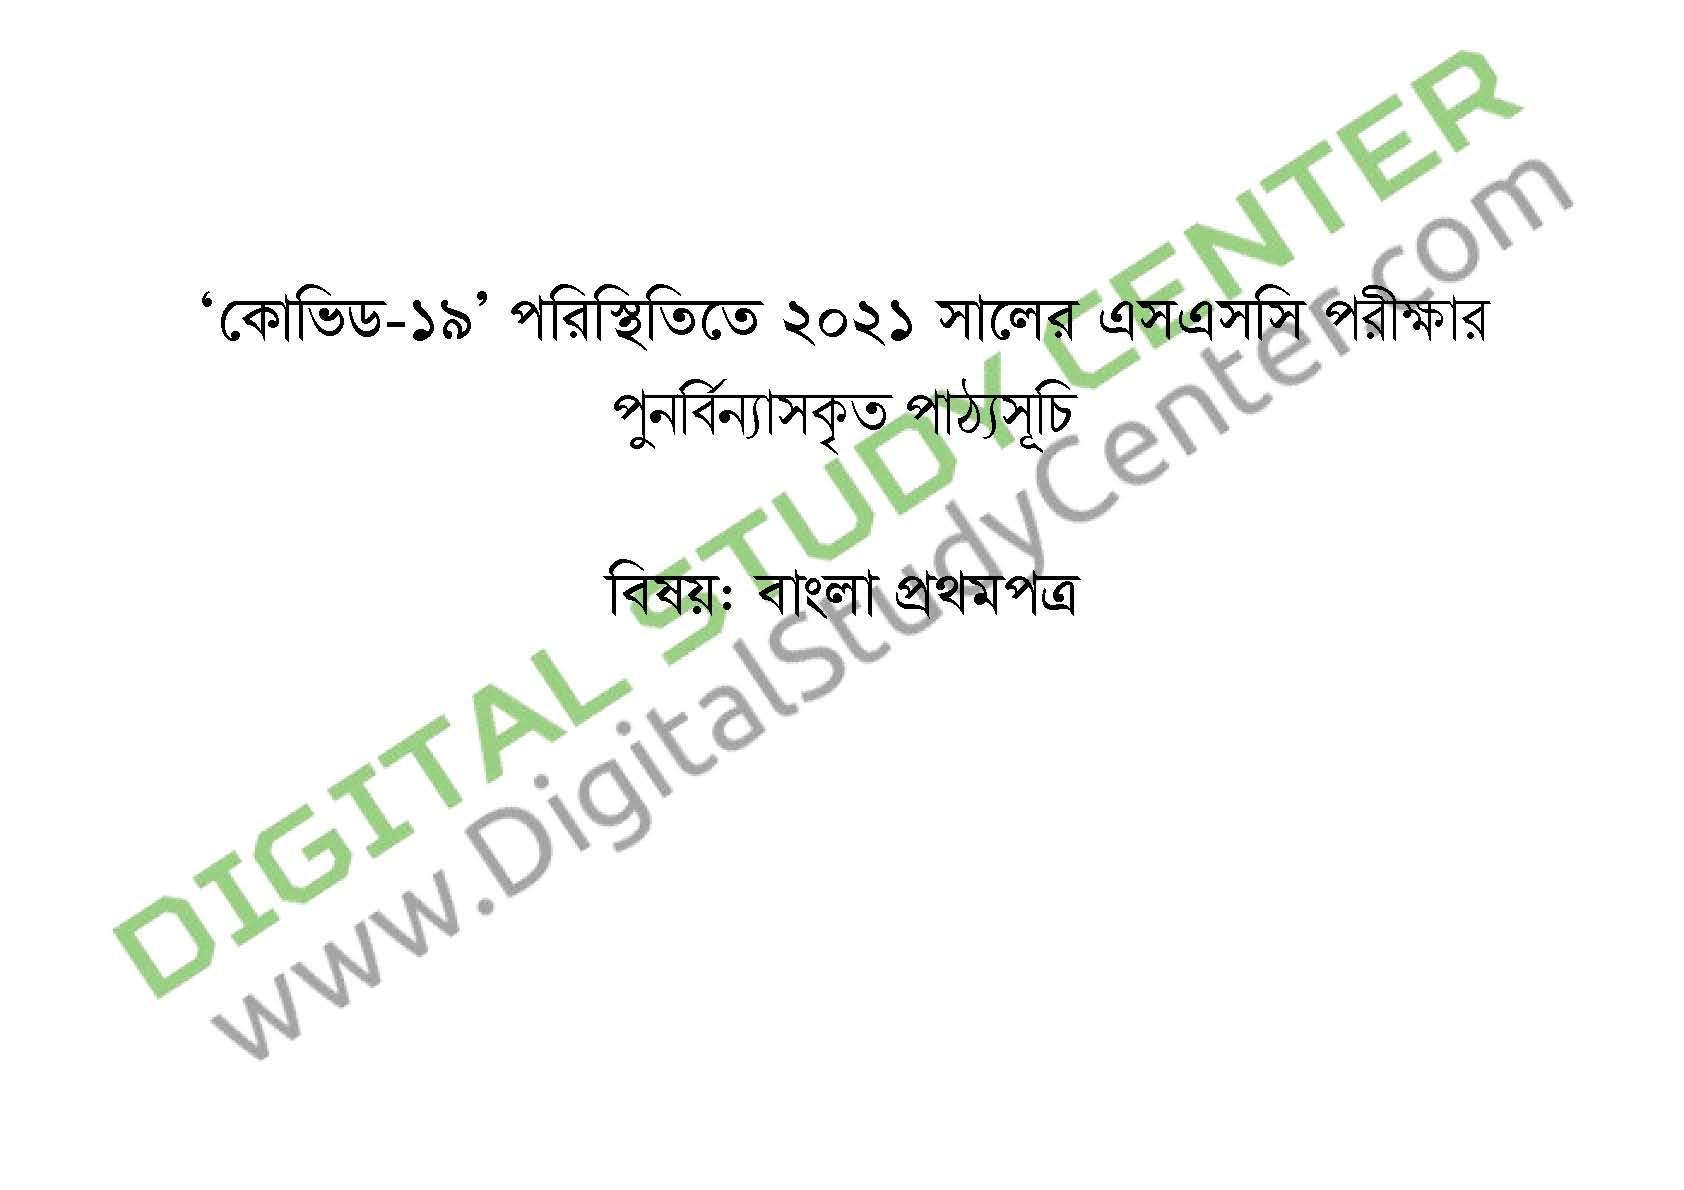 The restructured syllabus of SSC-2021 examination : Bangla